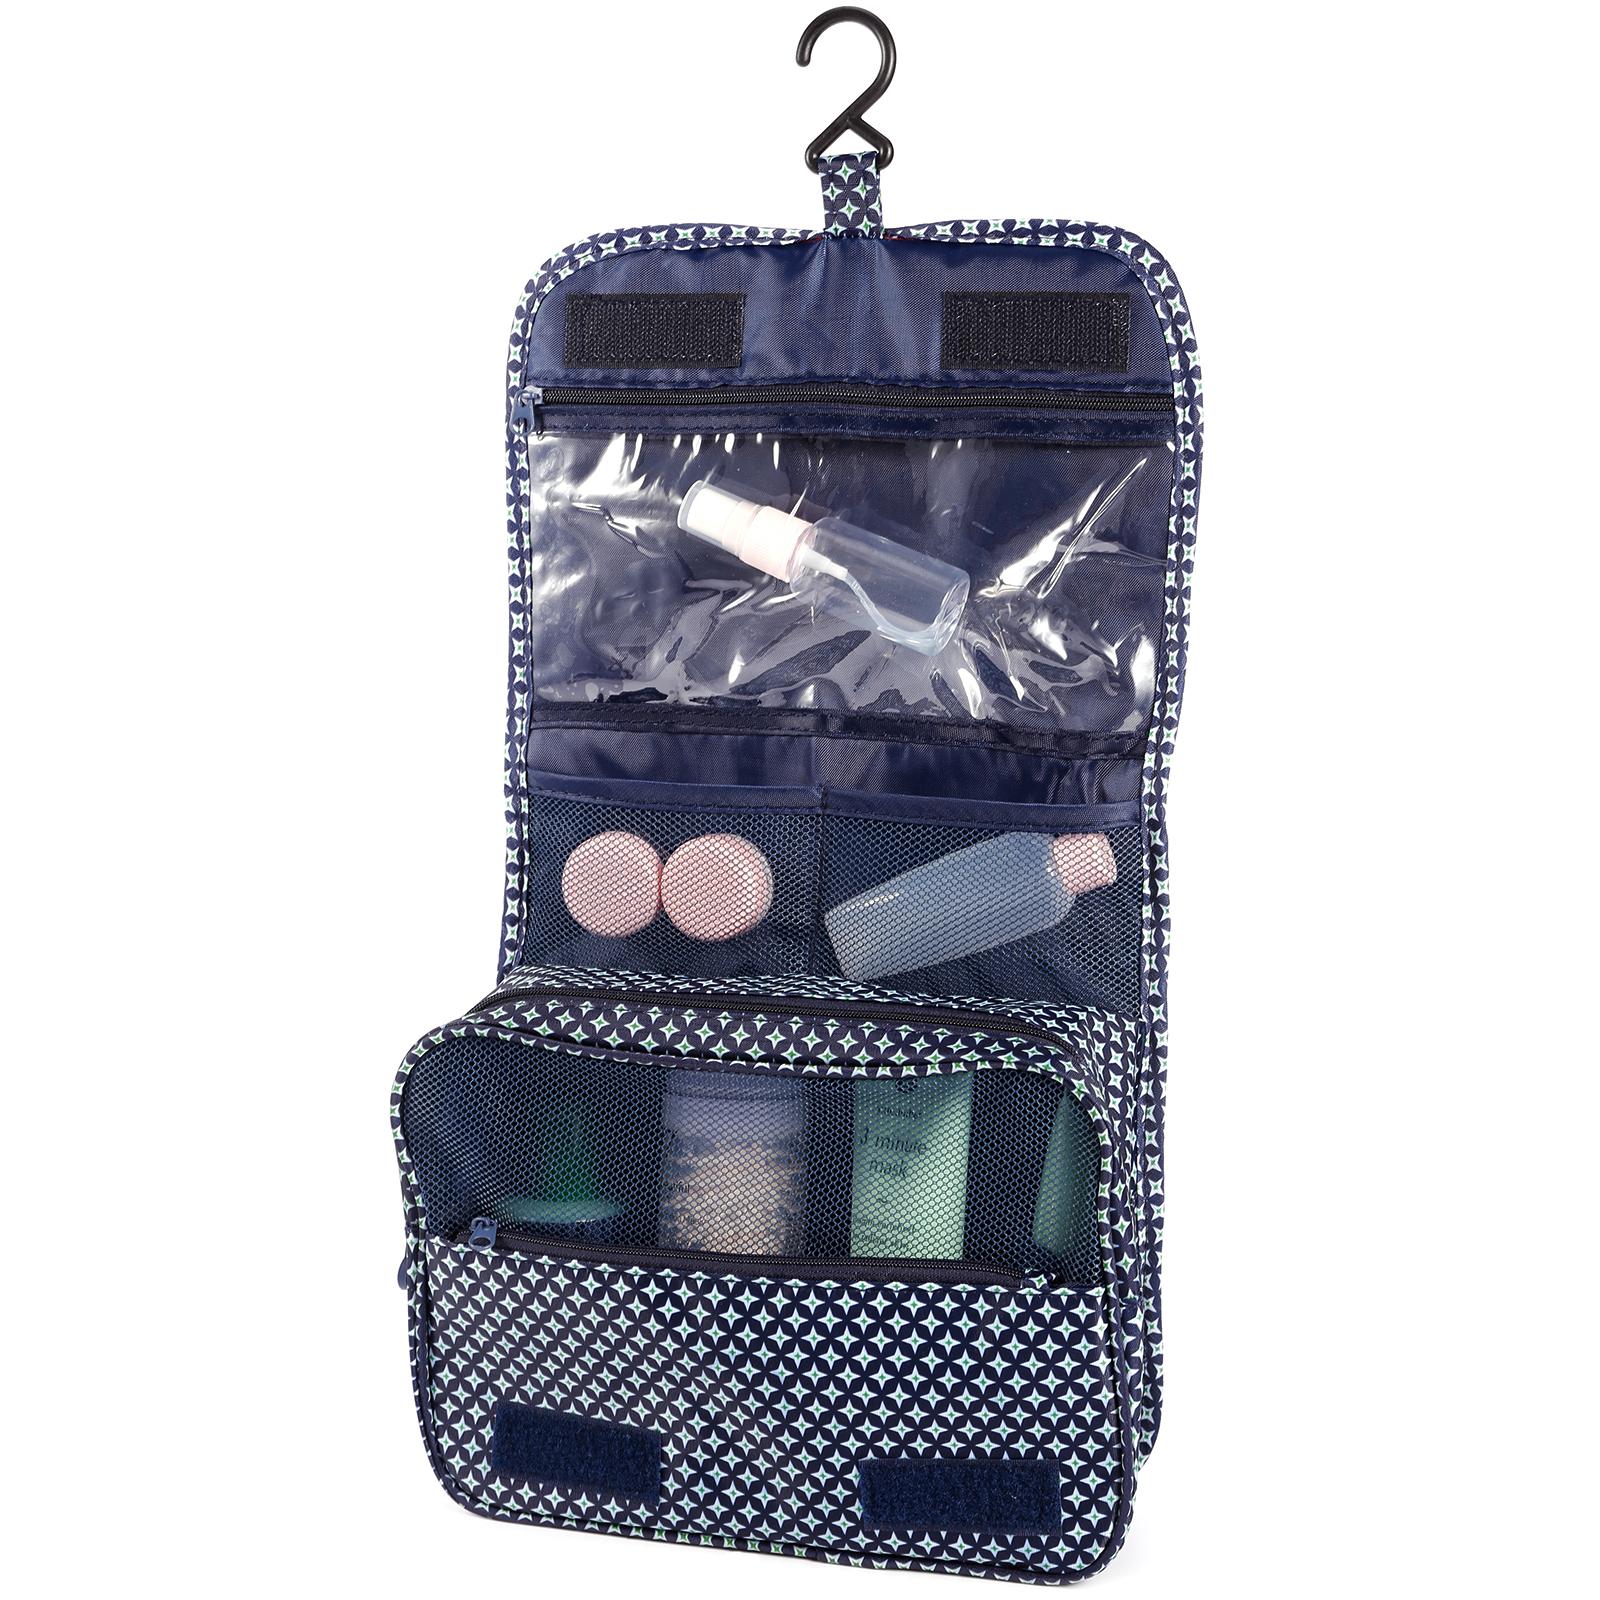 Luxury Brakeburn Womens Wash Bag | Cotswold Outdoor